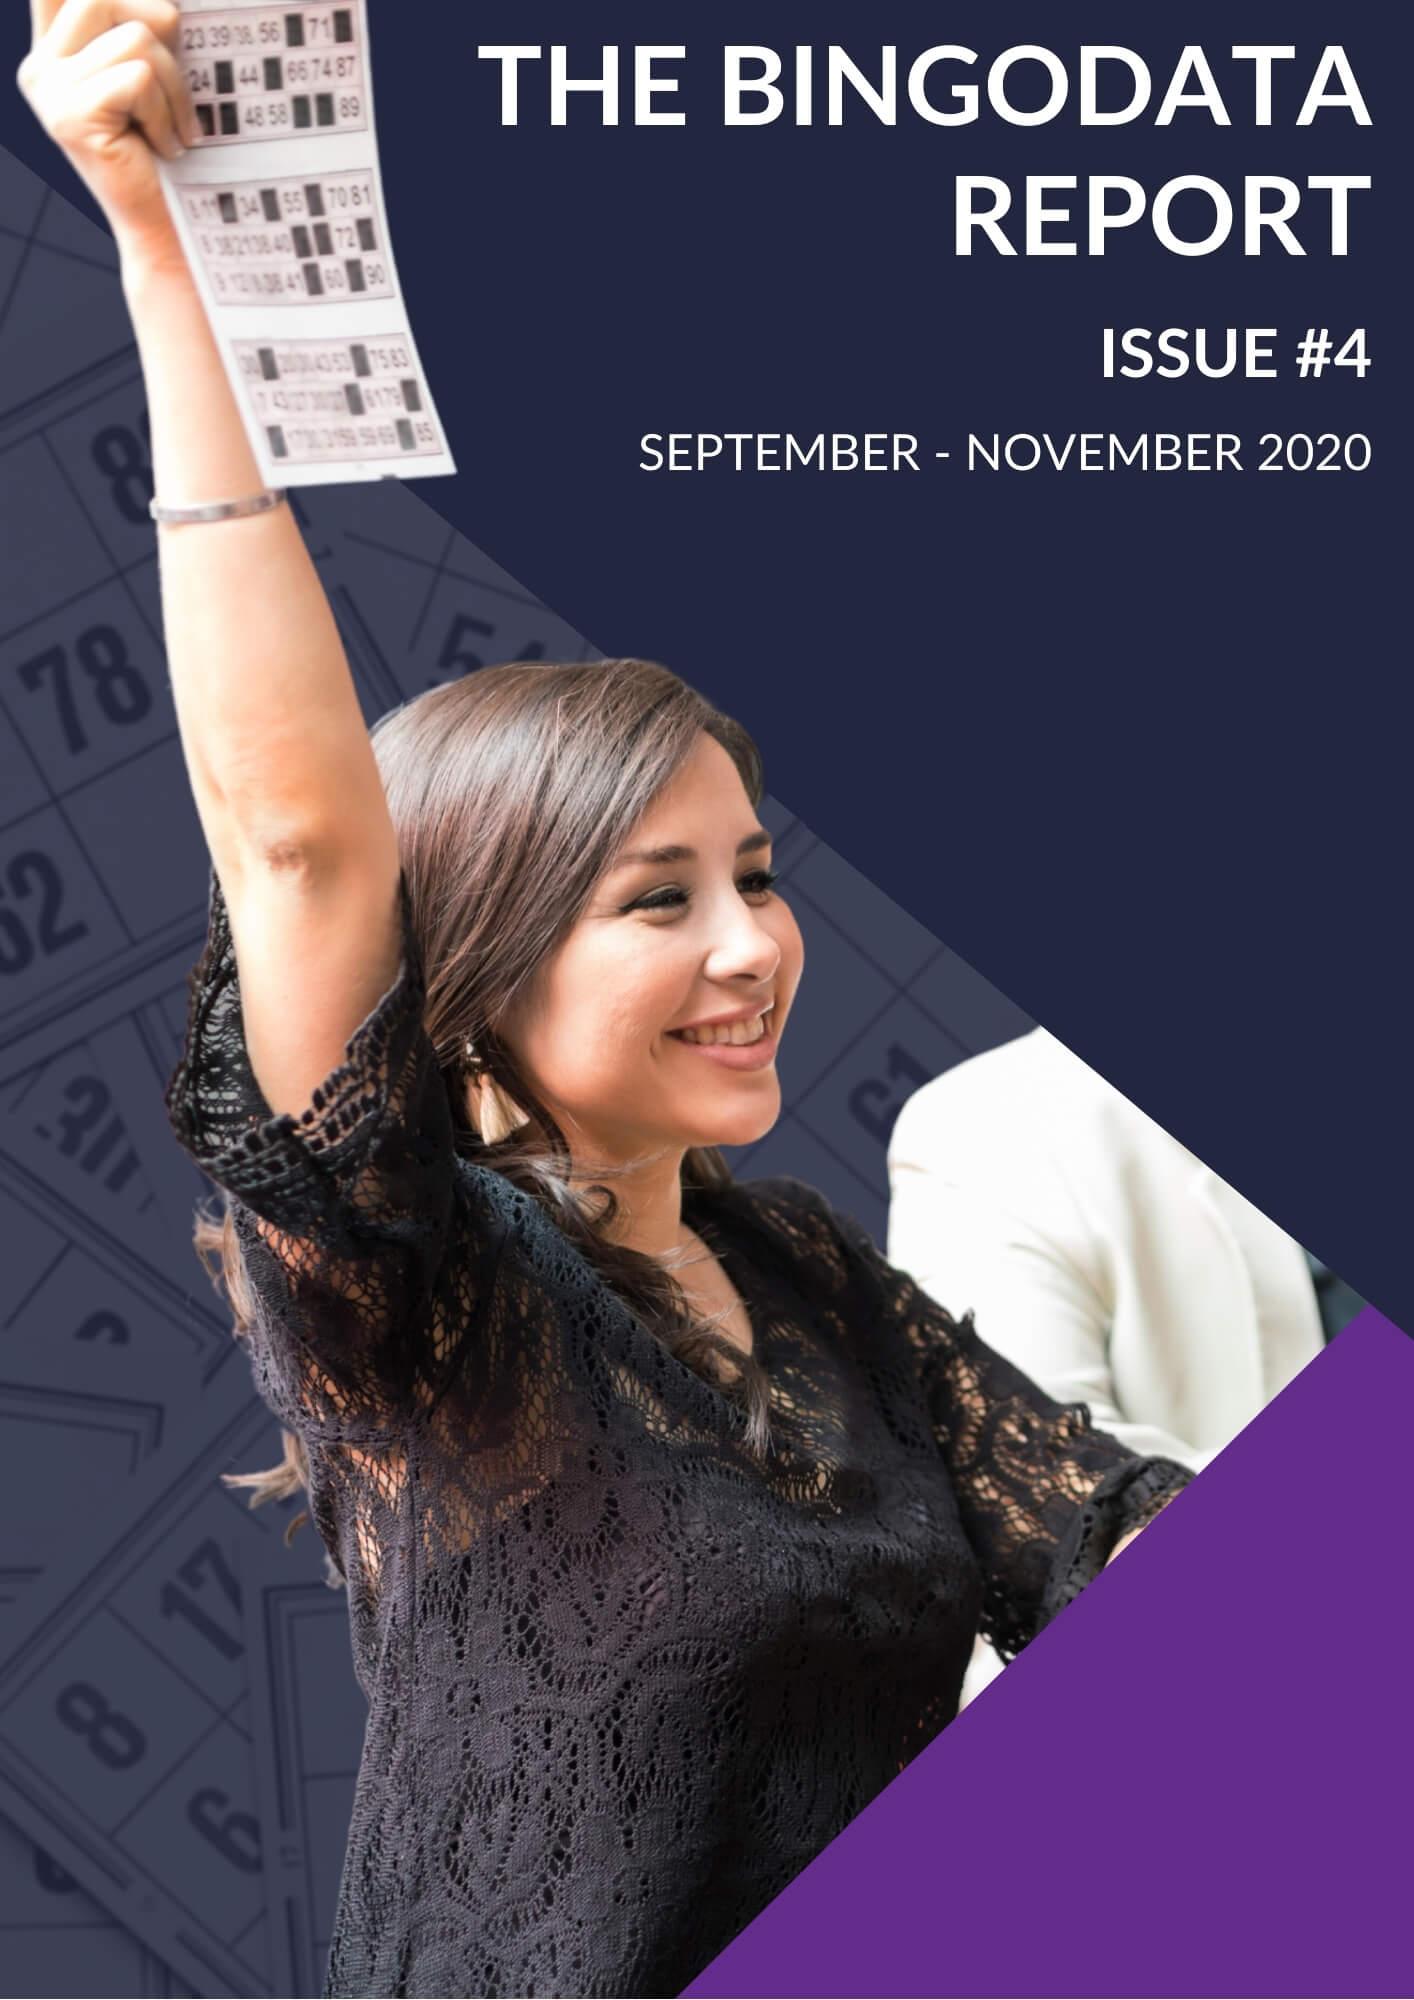 The BingoData Report Issue 4